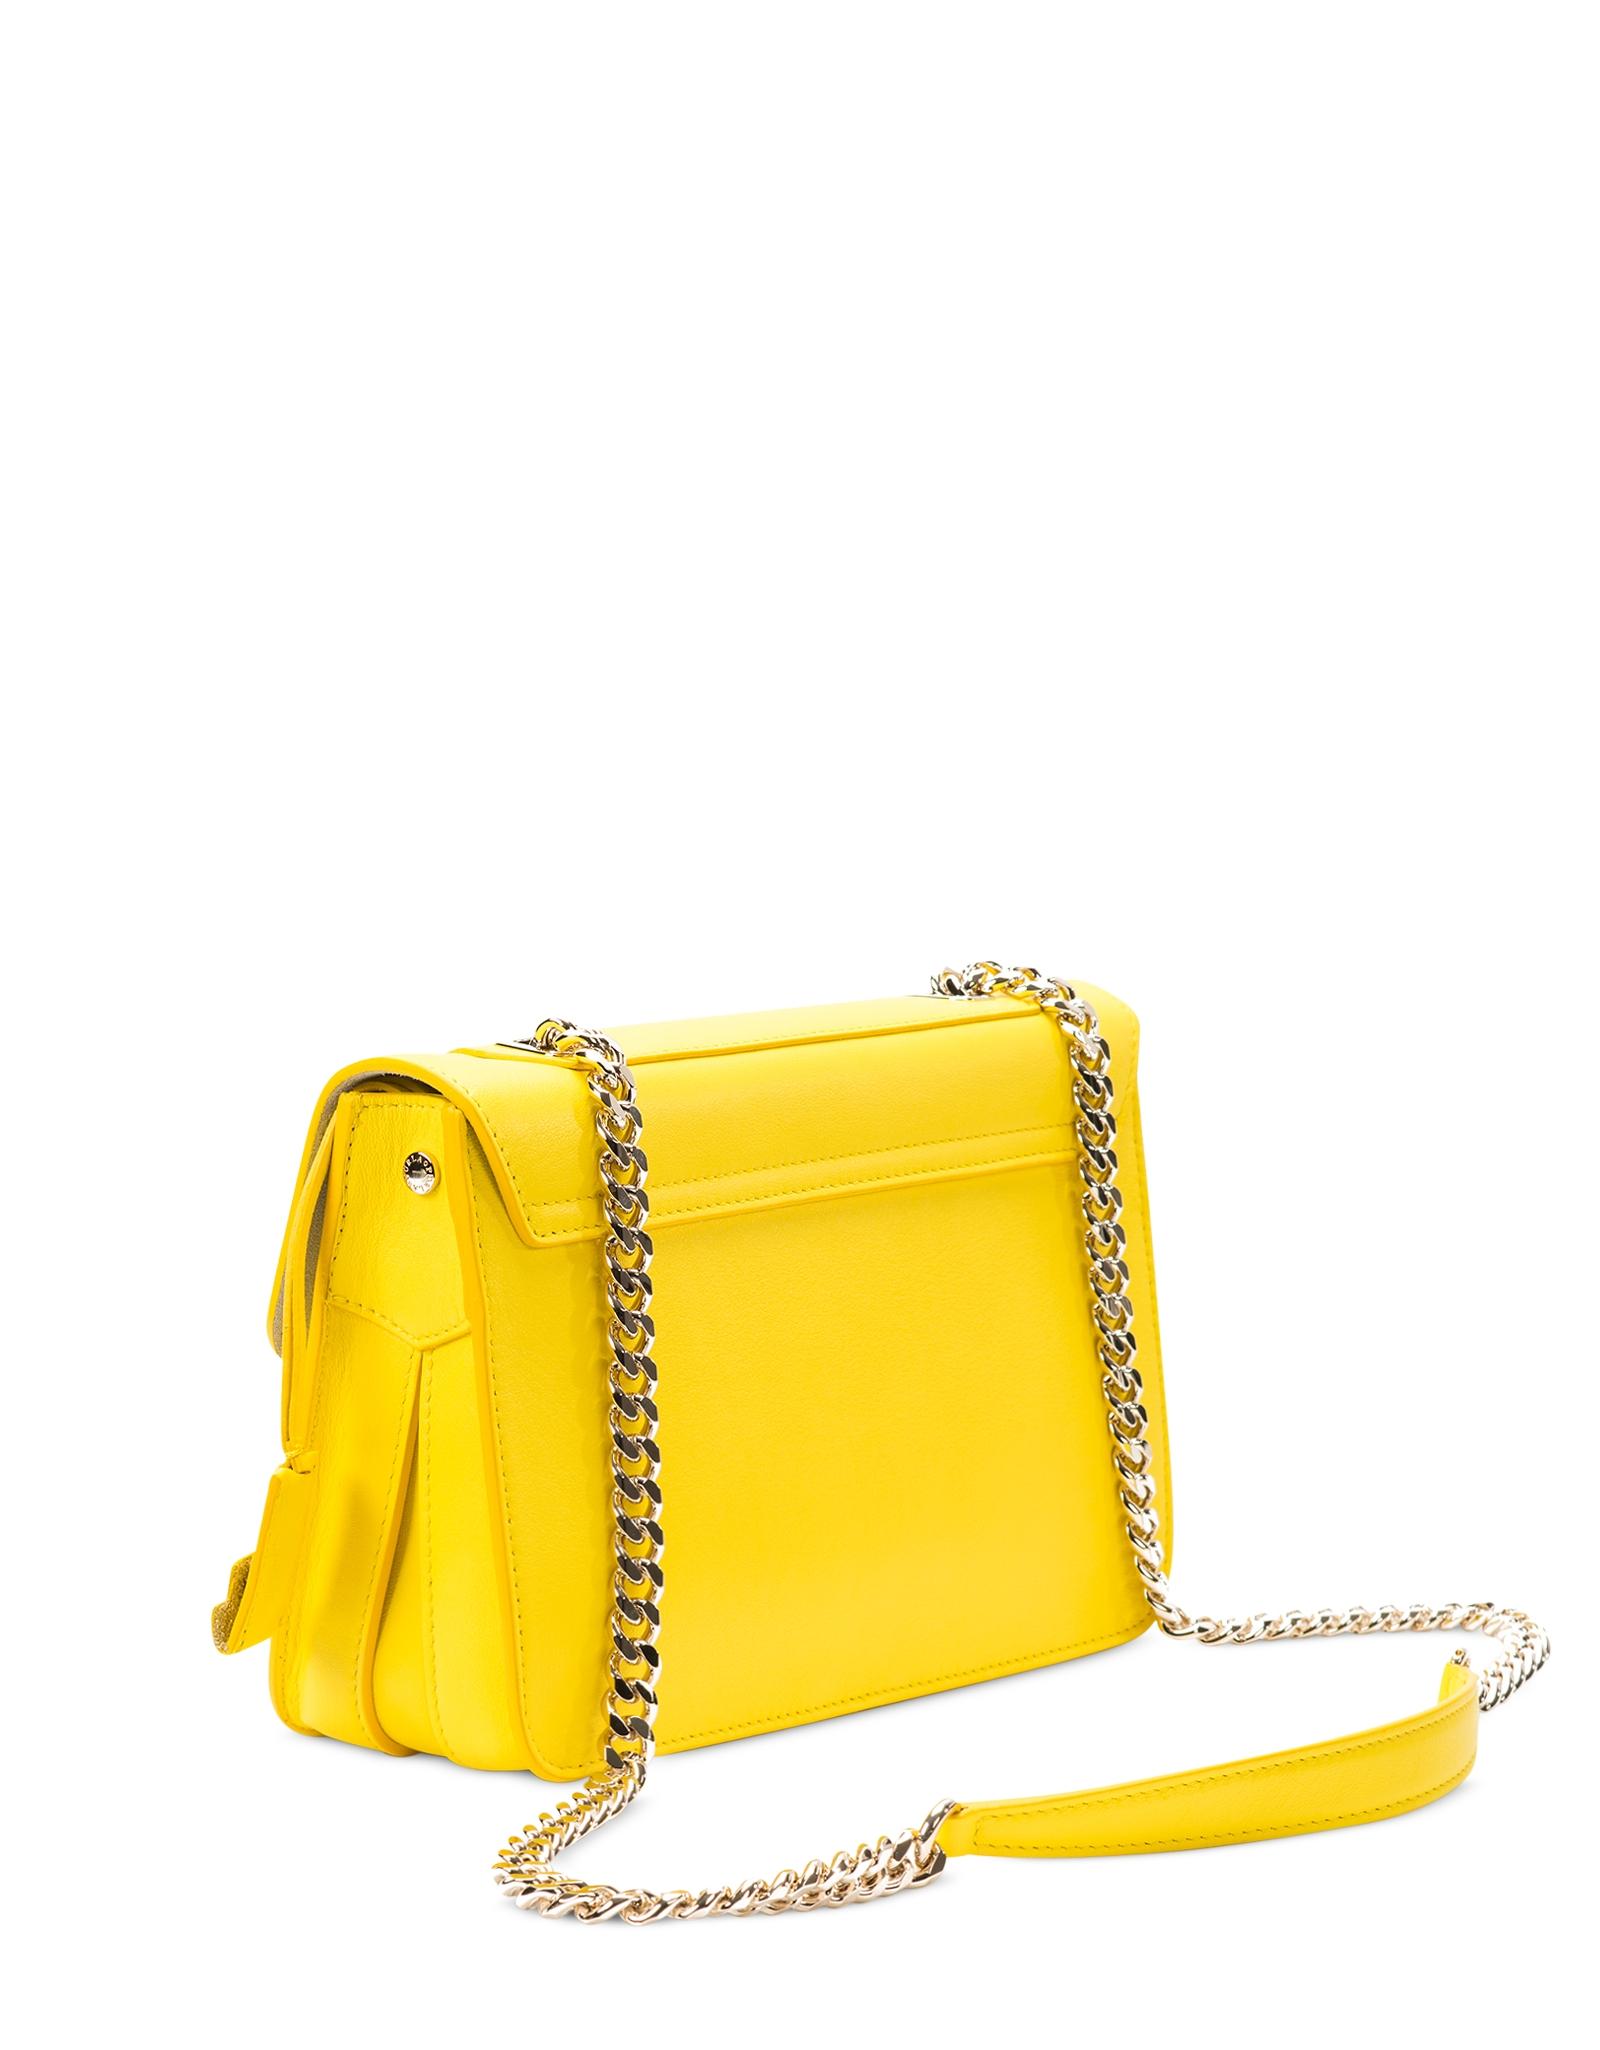 aa657cb541 Furla Alice Sunny Yellow Leather Crossbody Bag in Yellow - Lyst